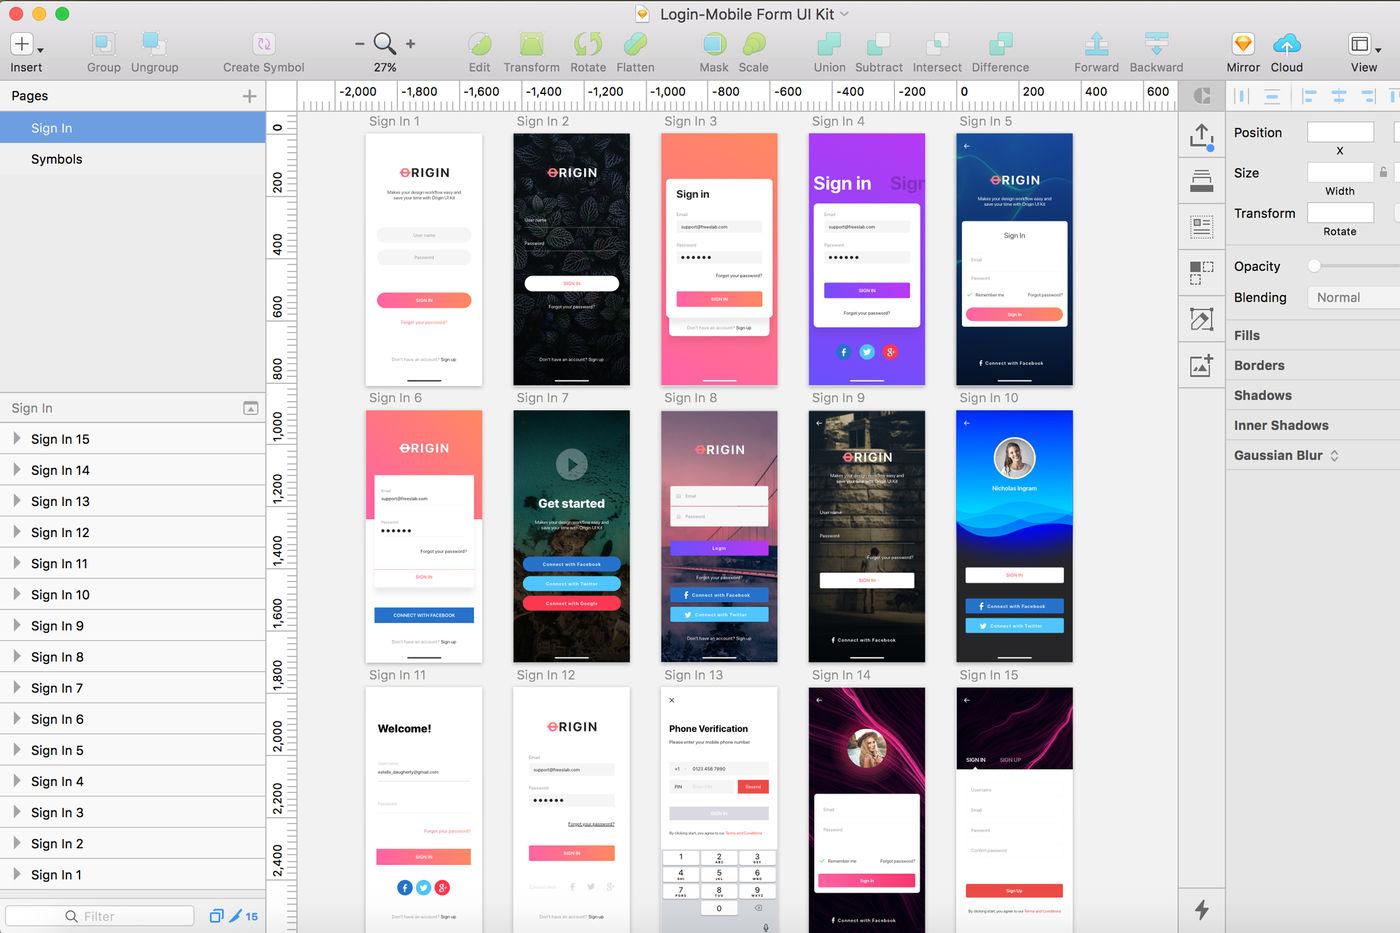 Login - Mobile Form UI Kit By hoangpts | TheHungryJPEG com